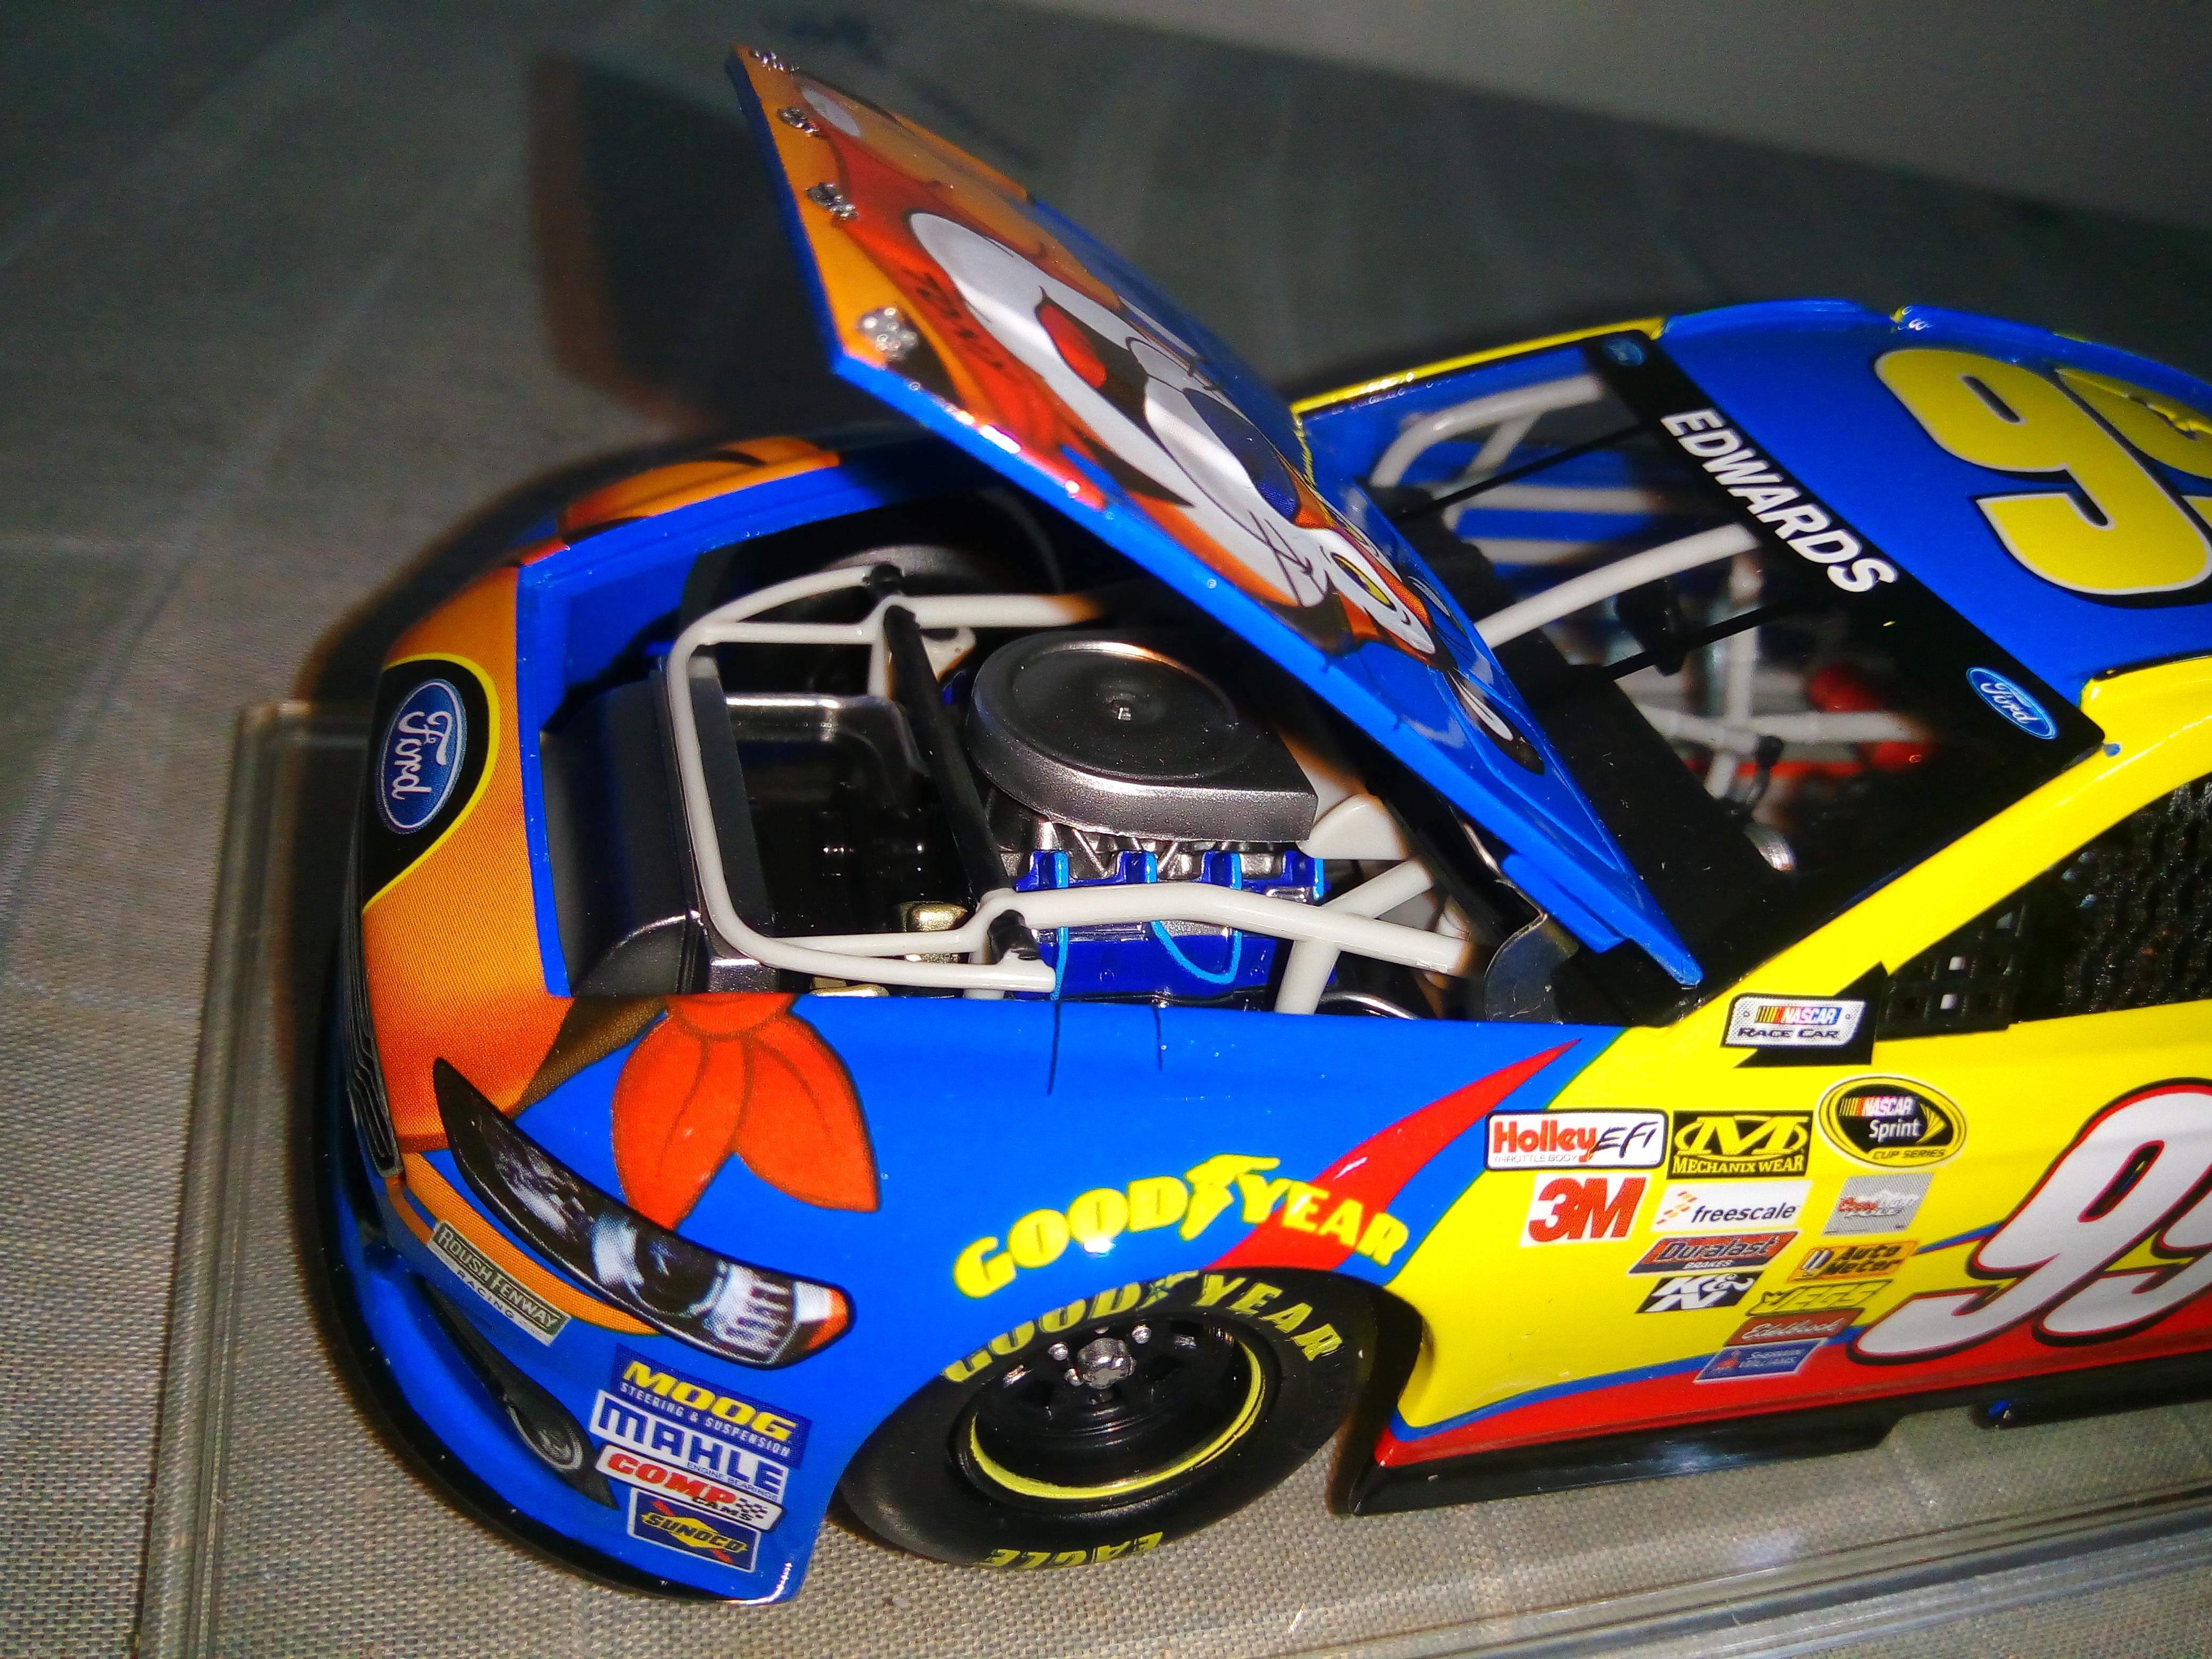 File:Lionel NASCAR diecast - Kap mesin.jpg